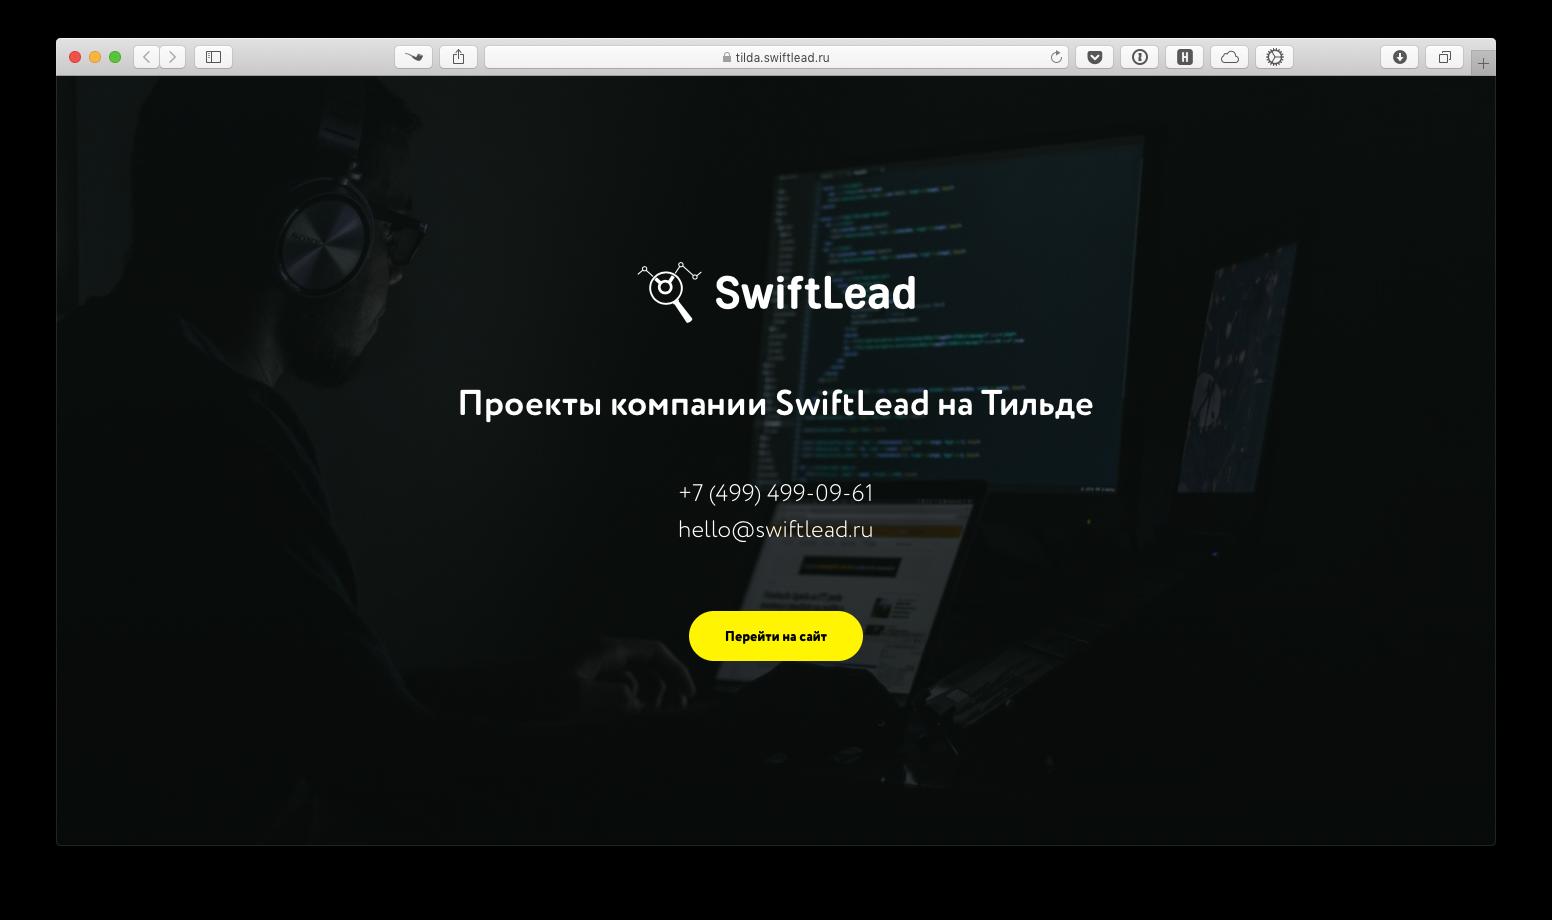 Проекты компании SwiftLead на Тильде